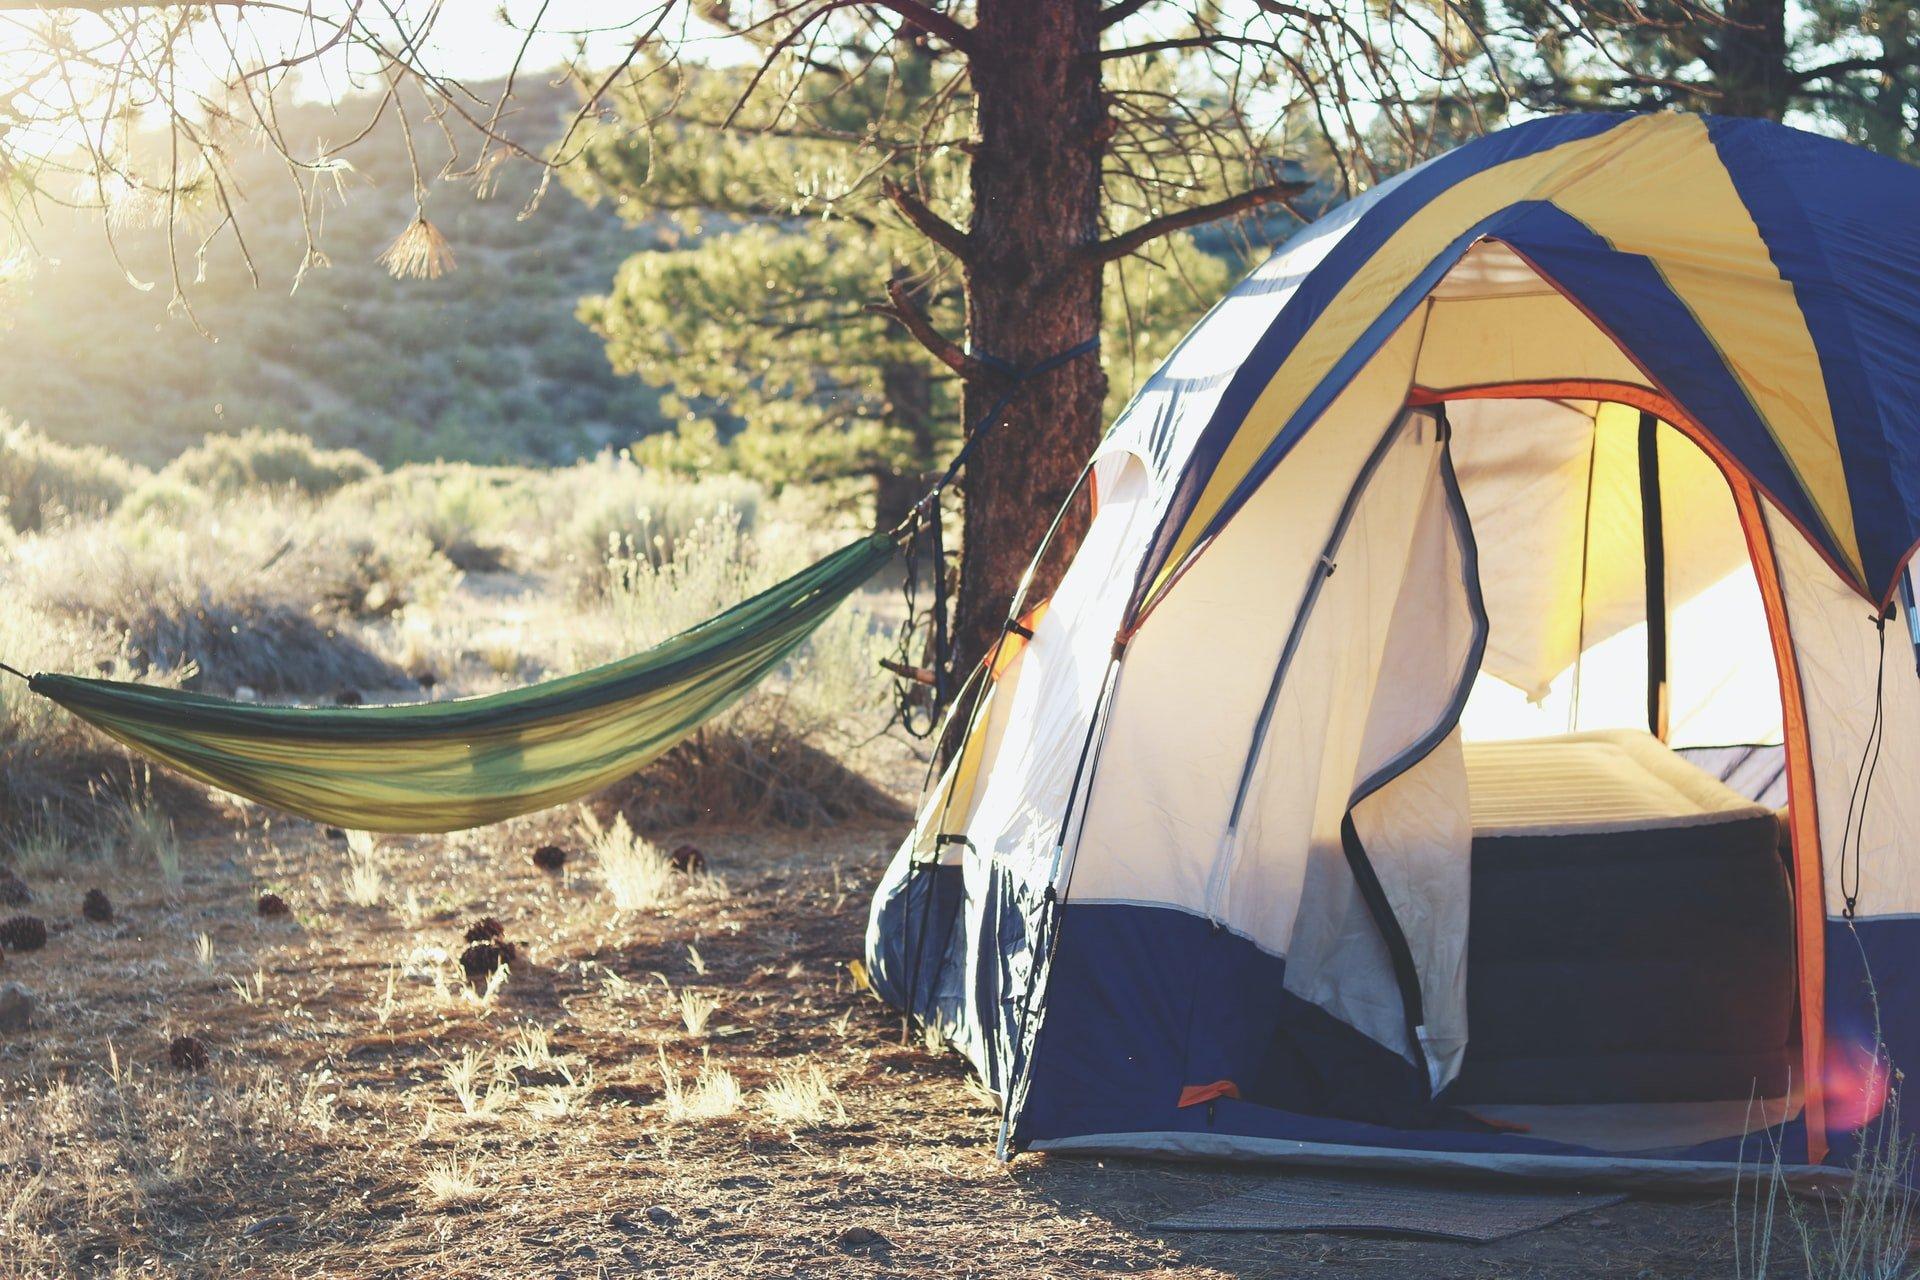 kampeertent-hangmat